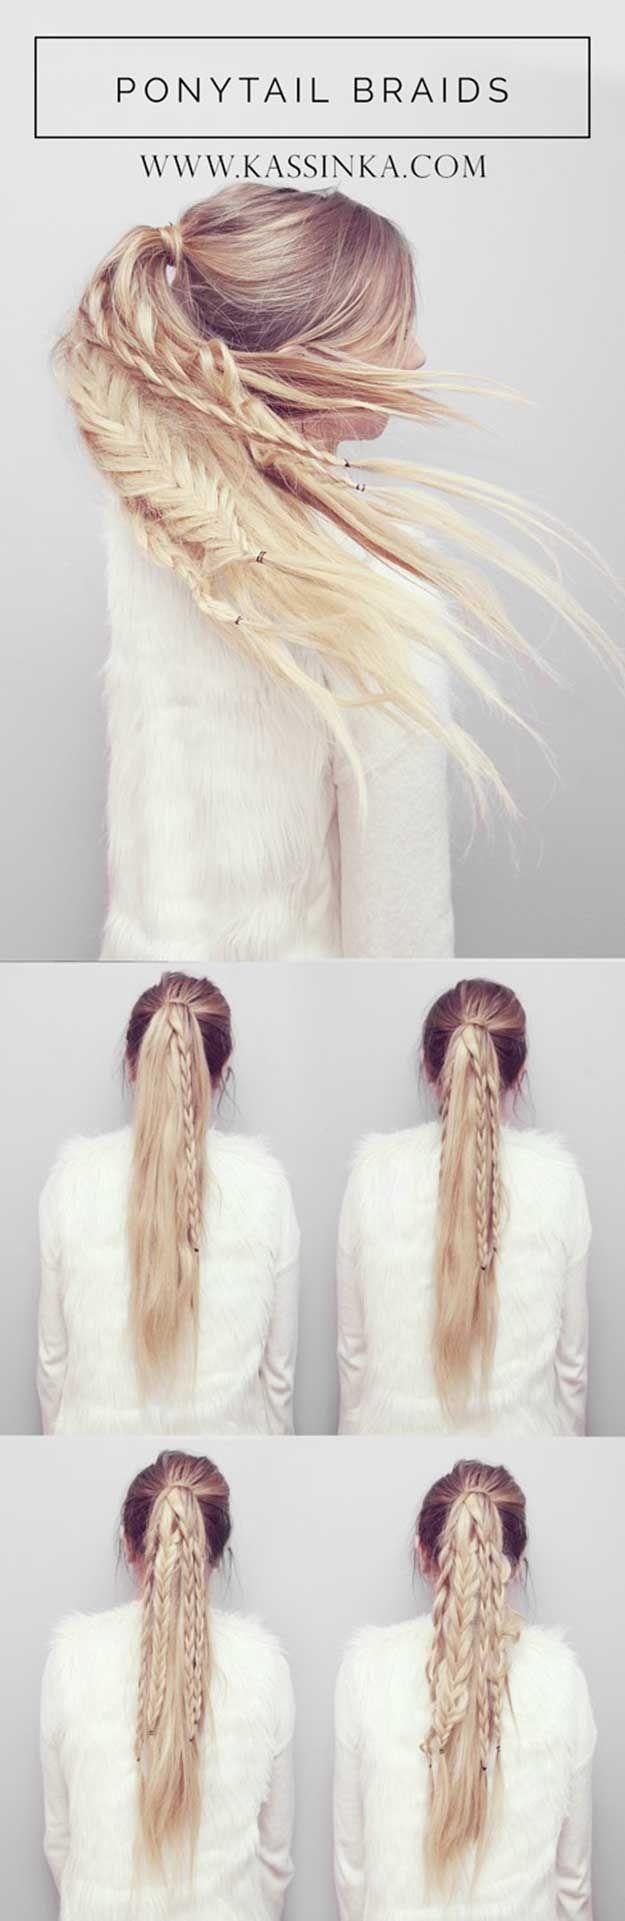 Best hairstyles for summer straight ponytail braids tutorial